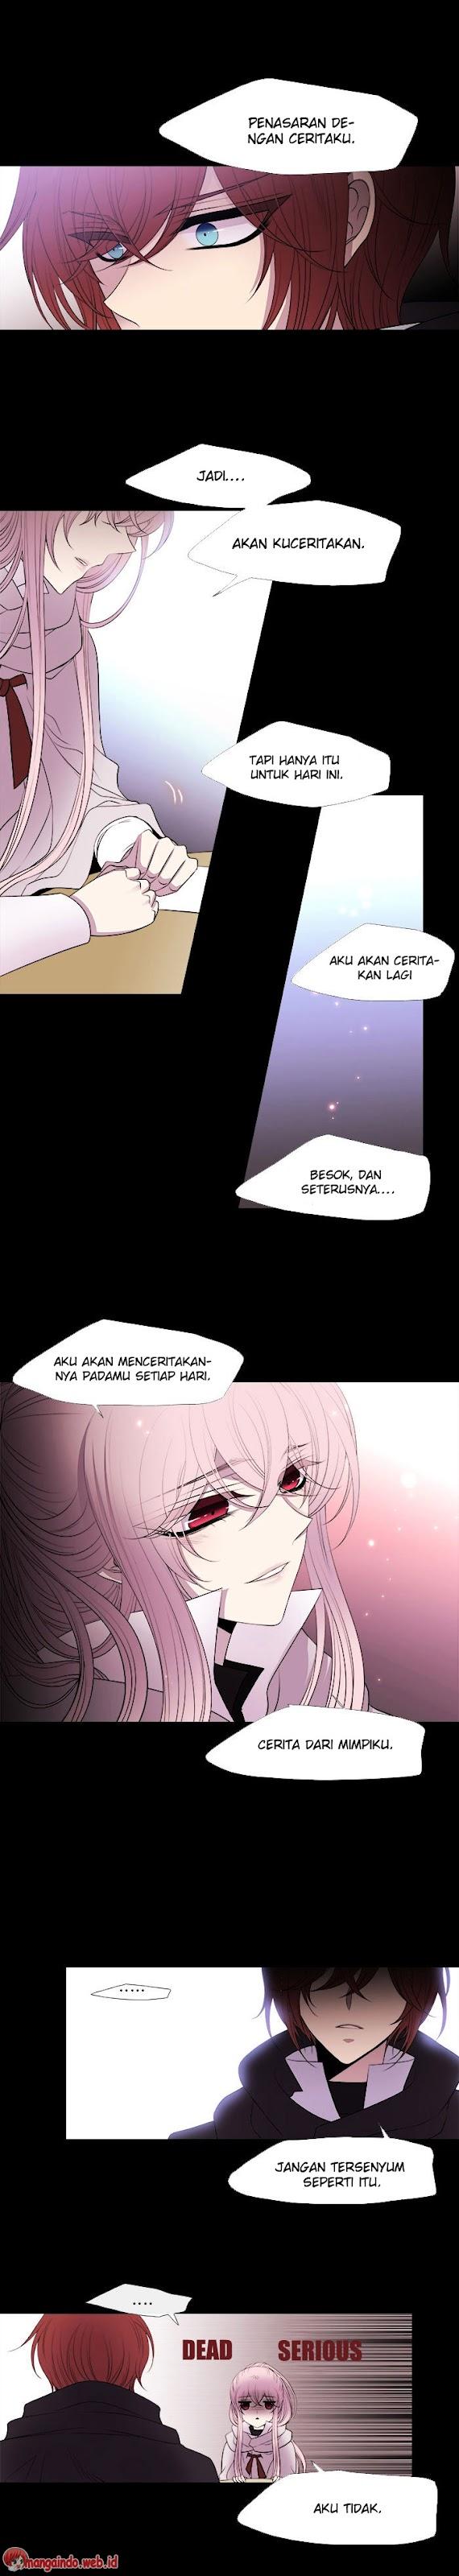 Komik black haze 212 - chapter 212 213 Indonesia black haze 212 - chapter 212 Terbaru 4|Baca Manga Komik Indonesia